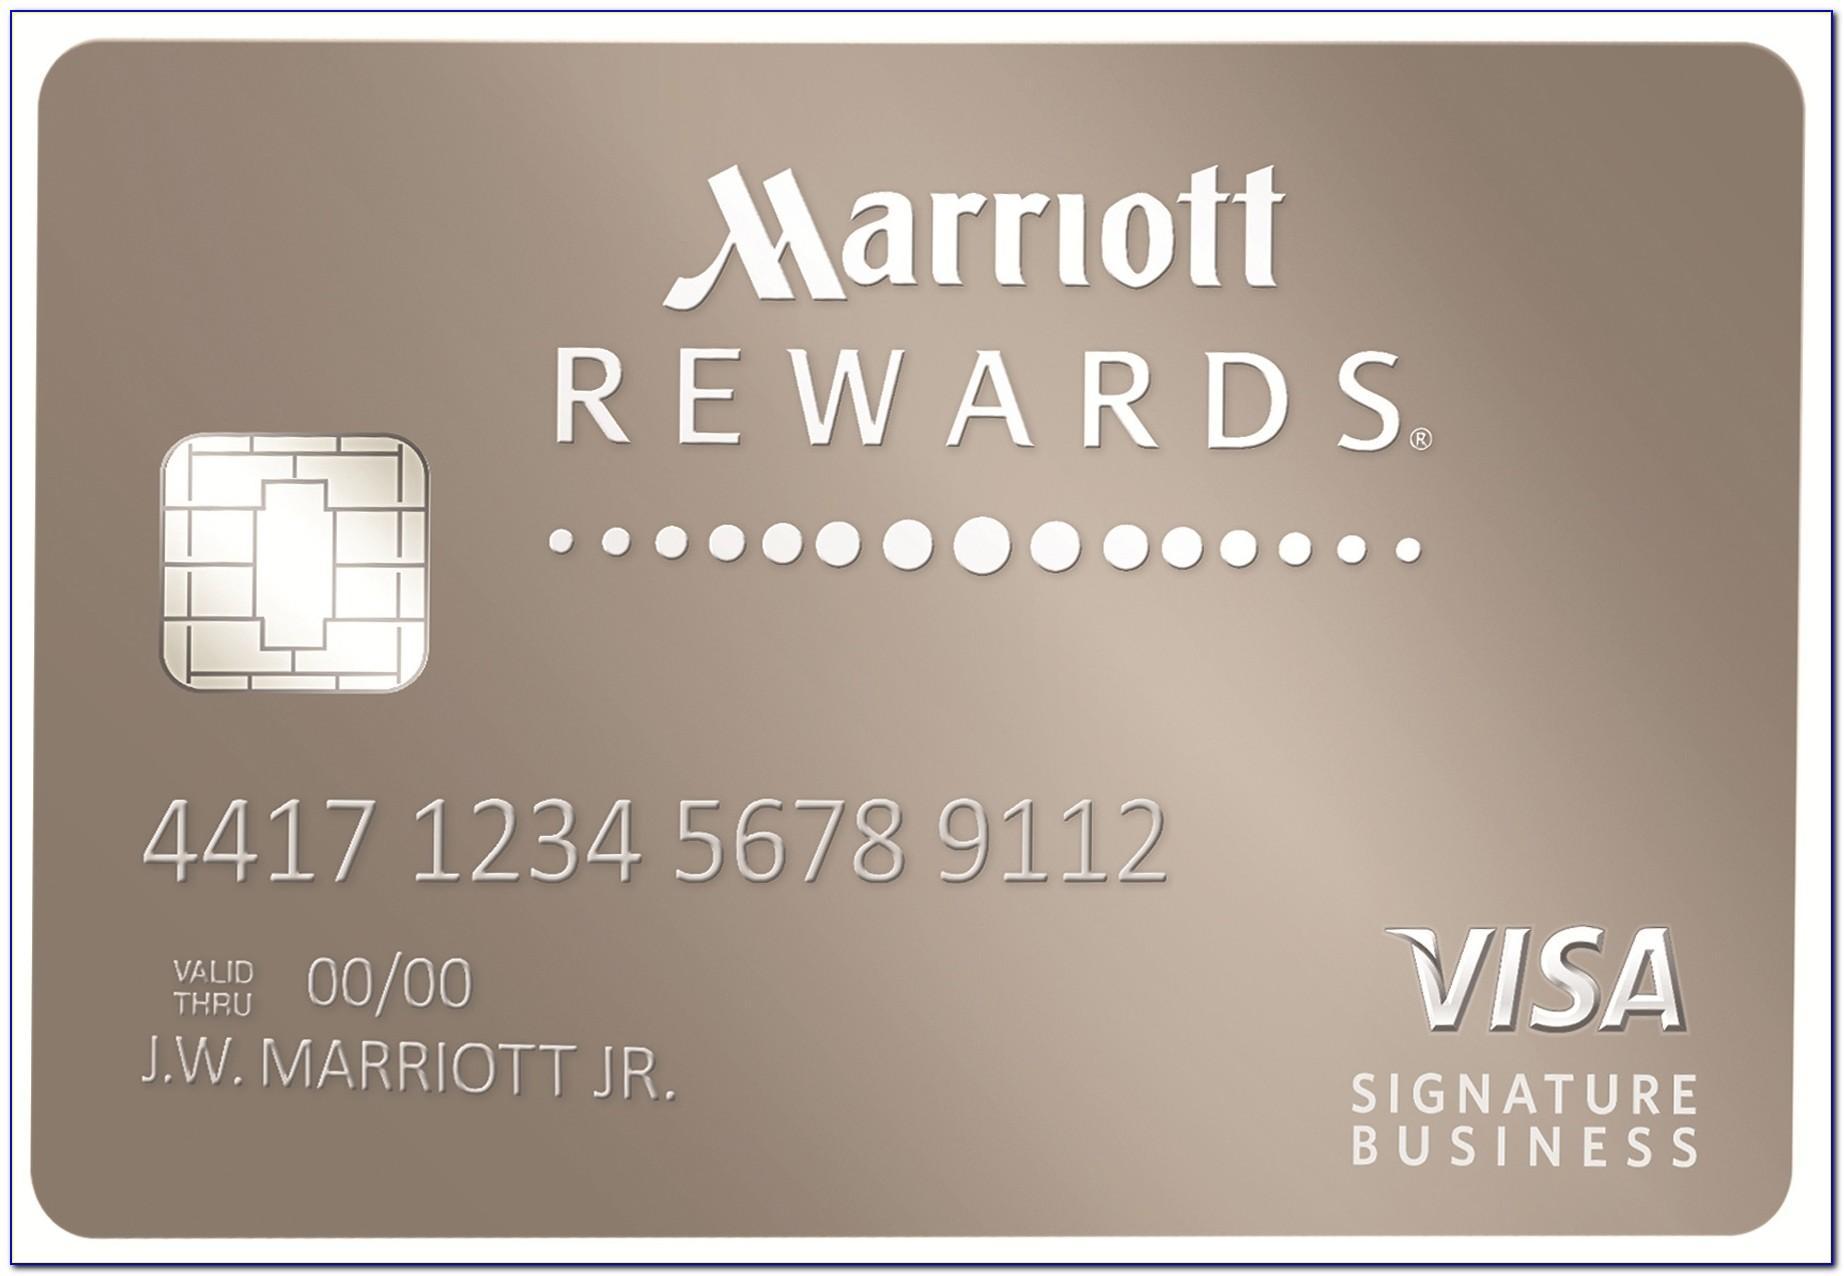 Chase Marriott Rewards Premier Business Credit Card